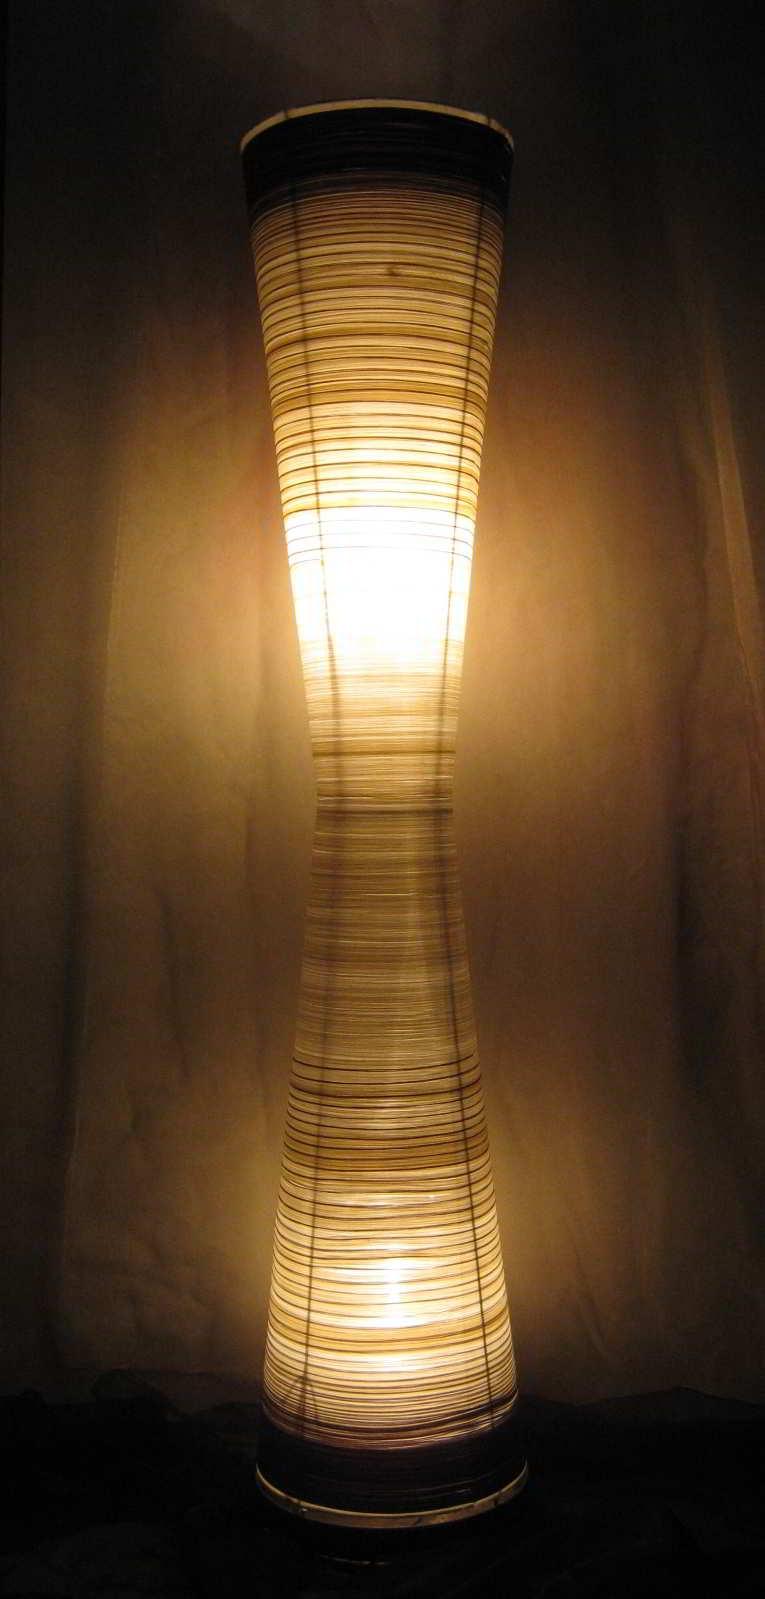 Lampade design lampade da arredo lampade moderne abat for Lampade da scrivania moderne